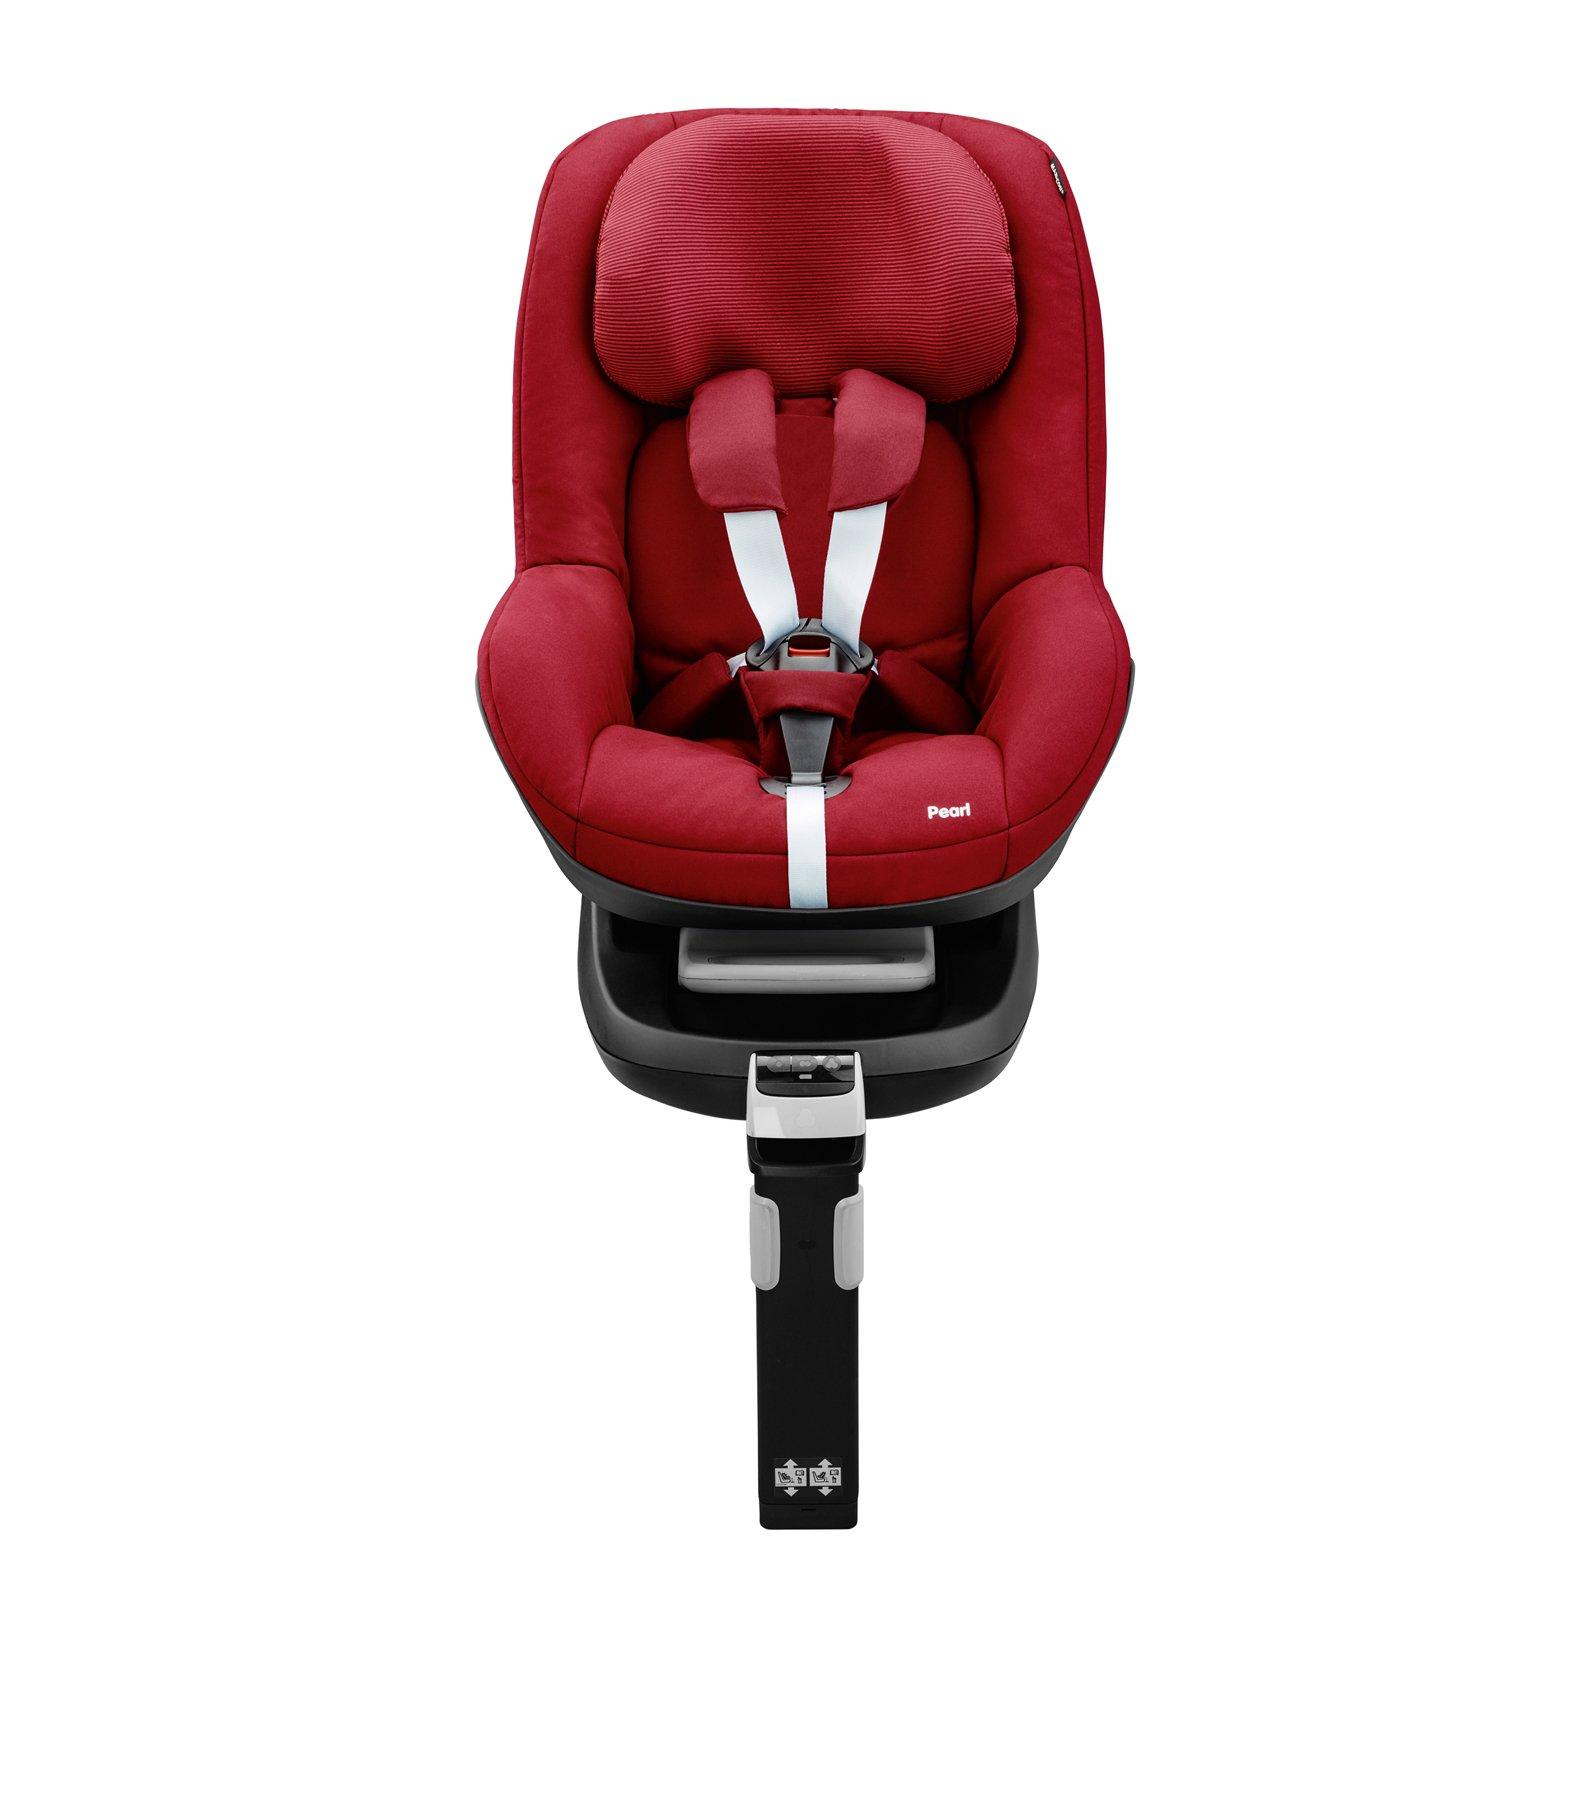 Maxi-Cosi 63409641Pearl Children's Seat, Group 1, 9-18kg Maxi-Cosi  71